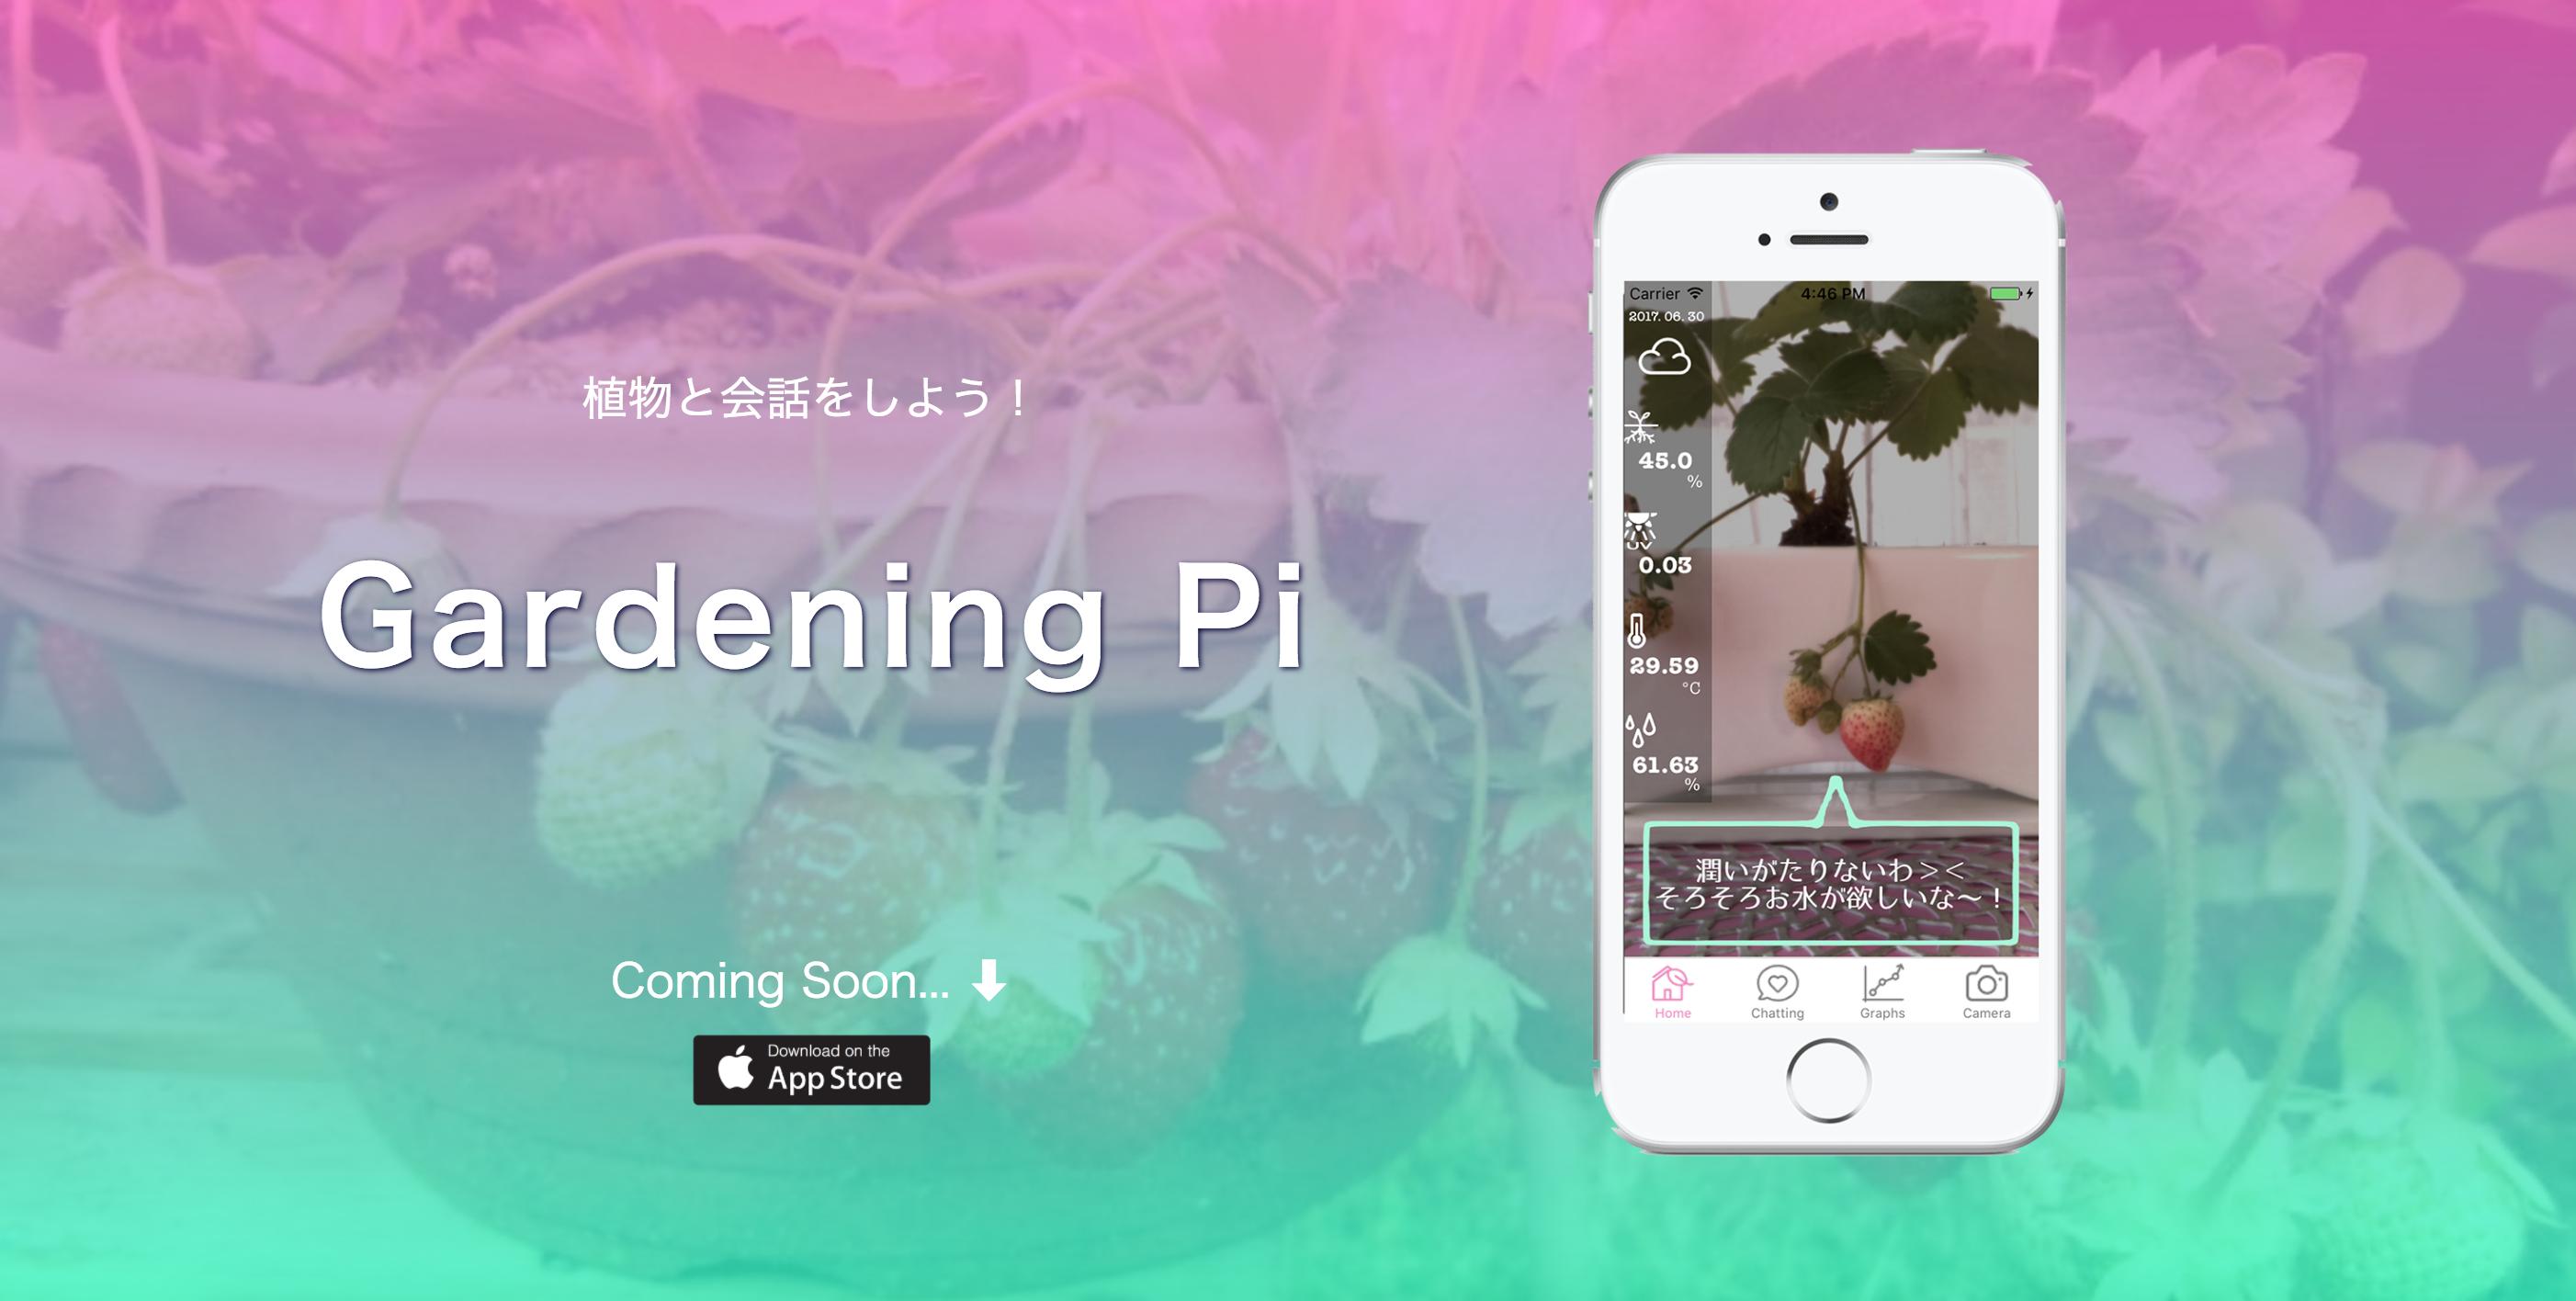 Gardening Pi